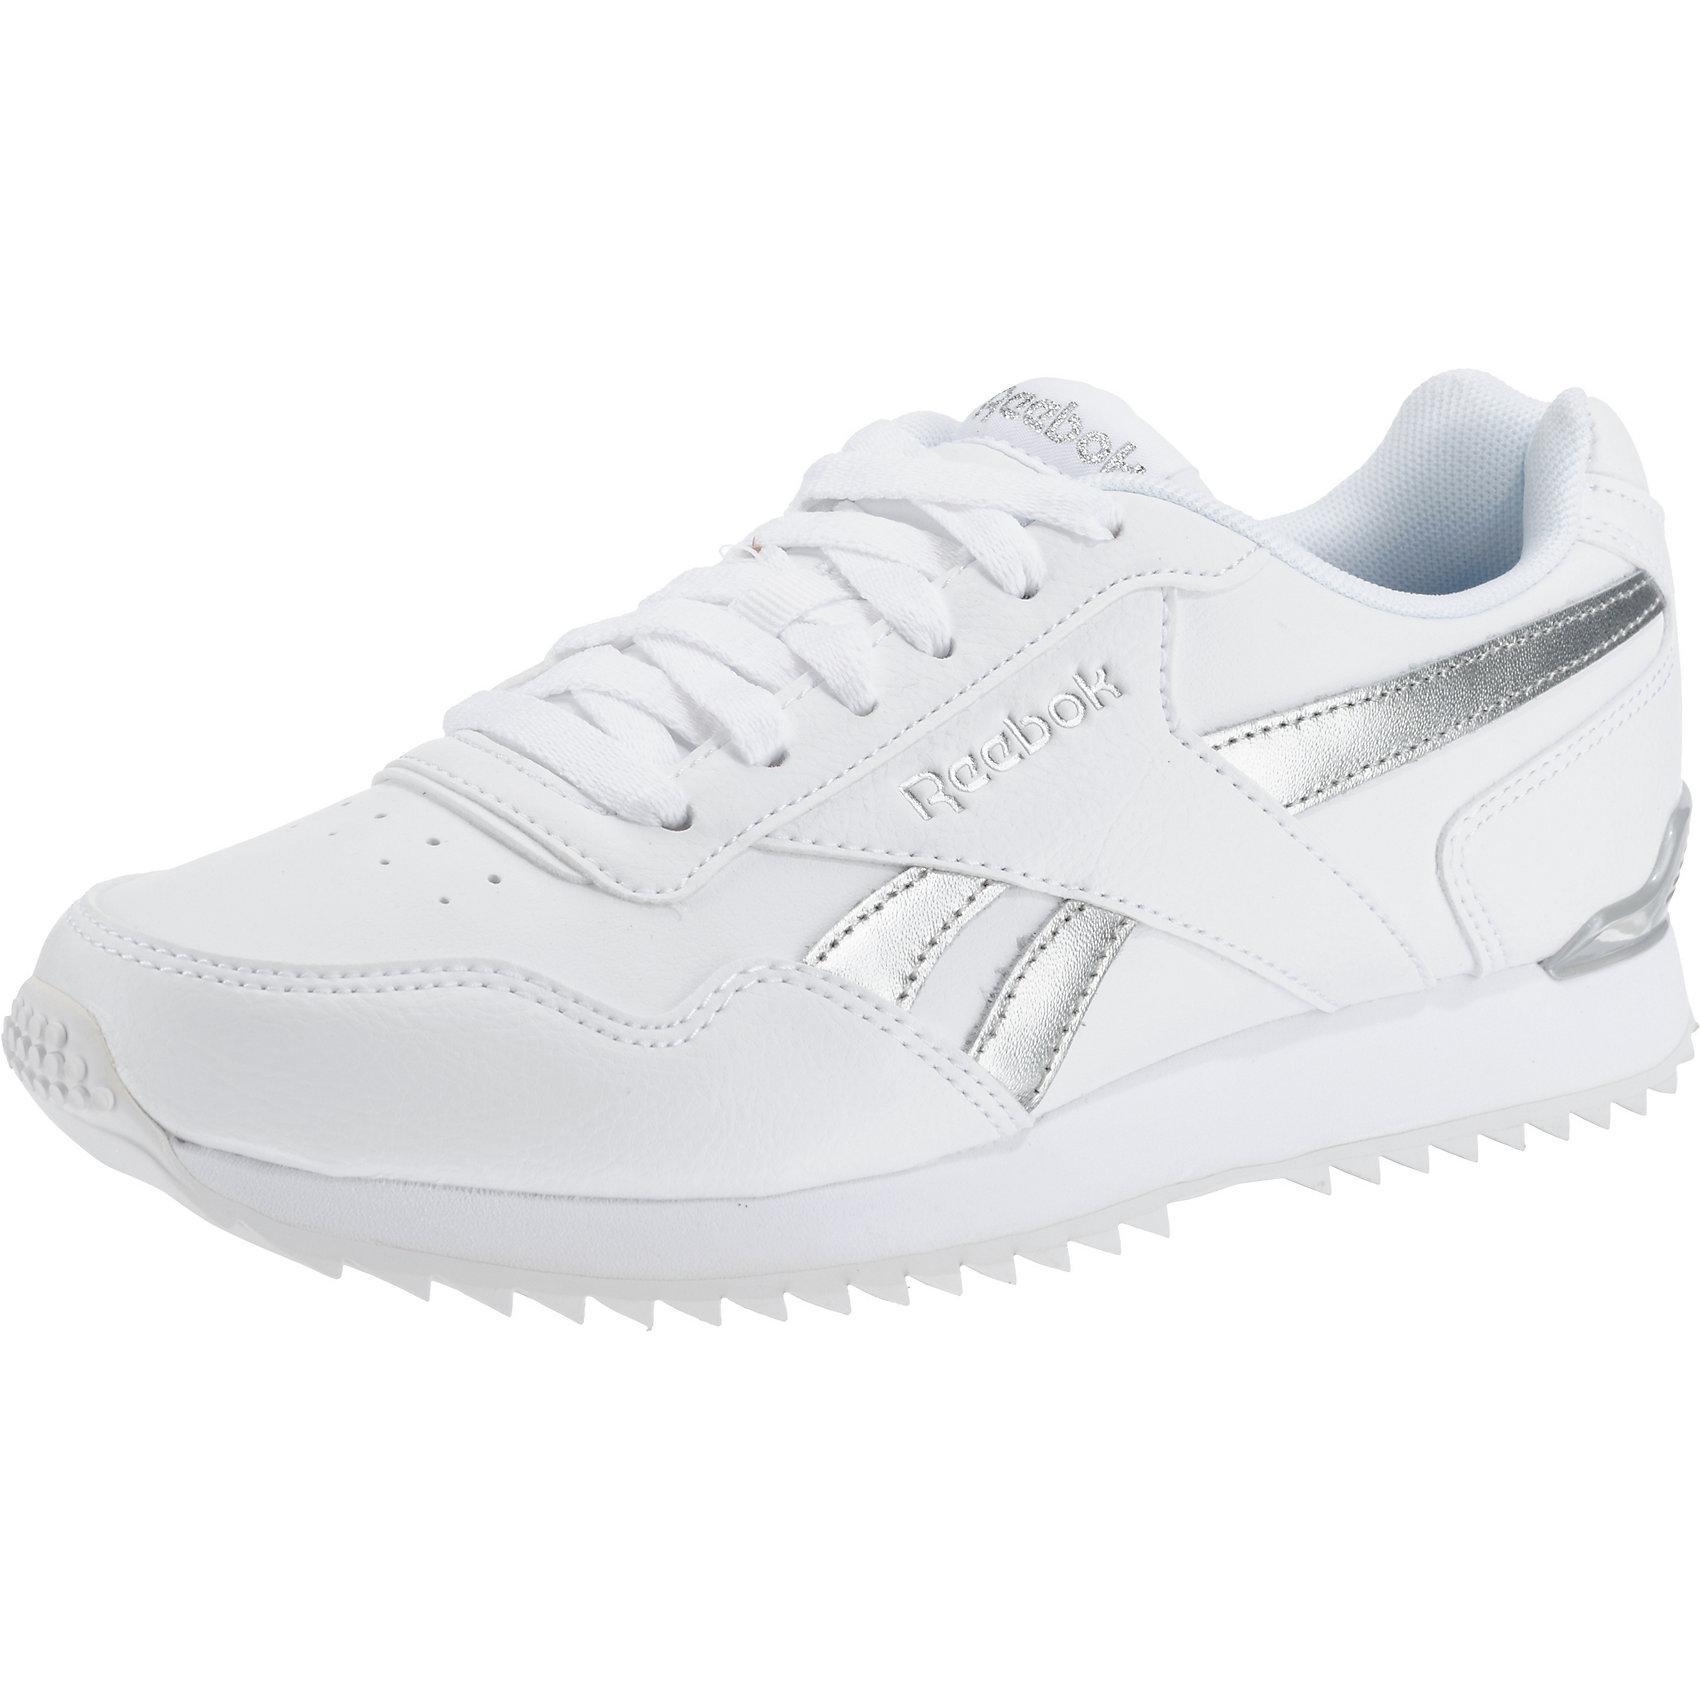 Neu Reebok ROYAL GLIDE RPLCLP Sneakers Niedrig für 7407994 für Niedrig Damen weiß ... e7952a